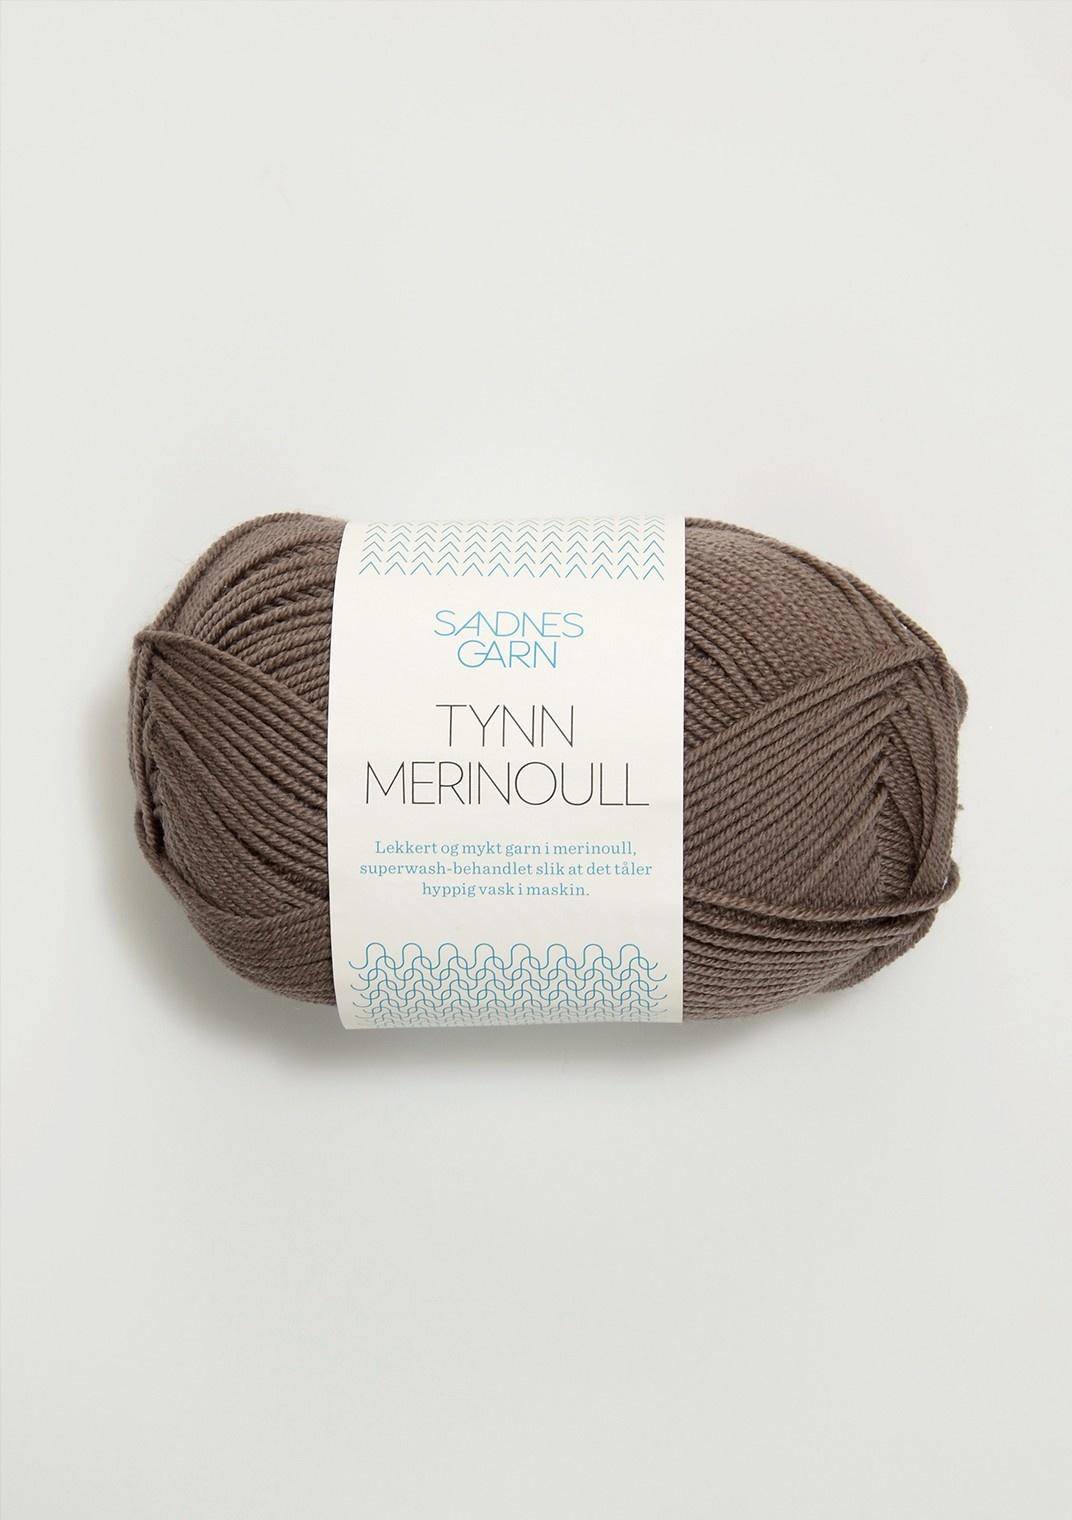 Sandnes Tynn Merino Ull - 3161 - Mellobrun